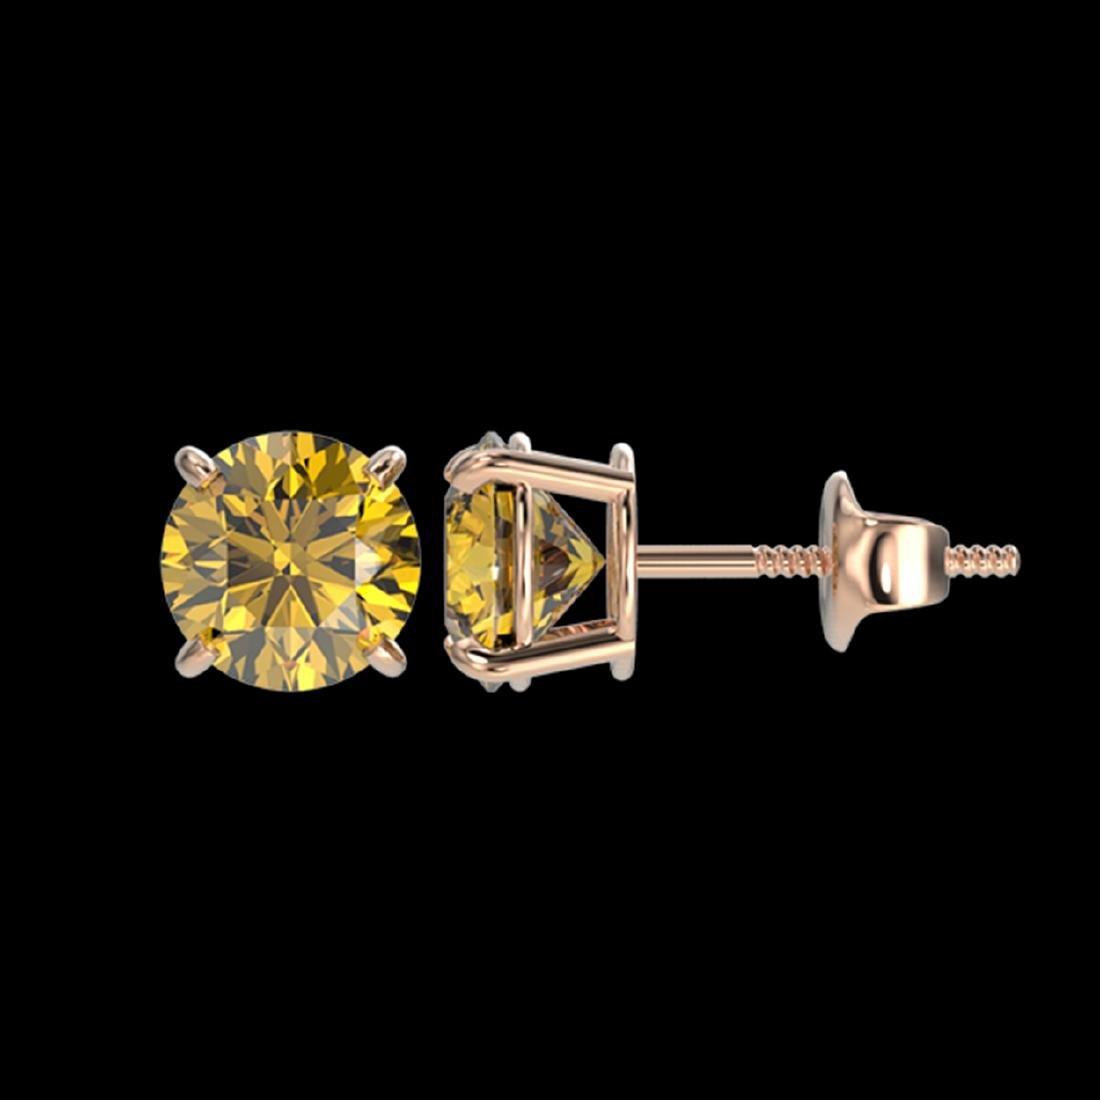 1.54 ctw Intense Yellow Diamond Stud Earrings 10K Rose - 2